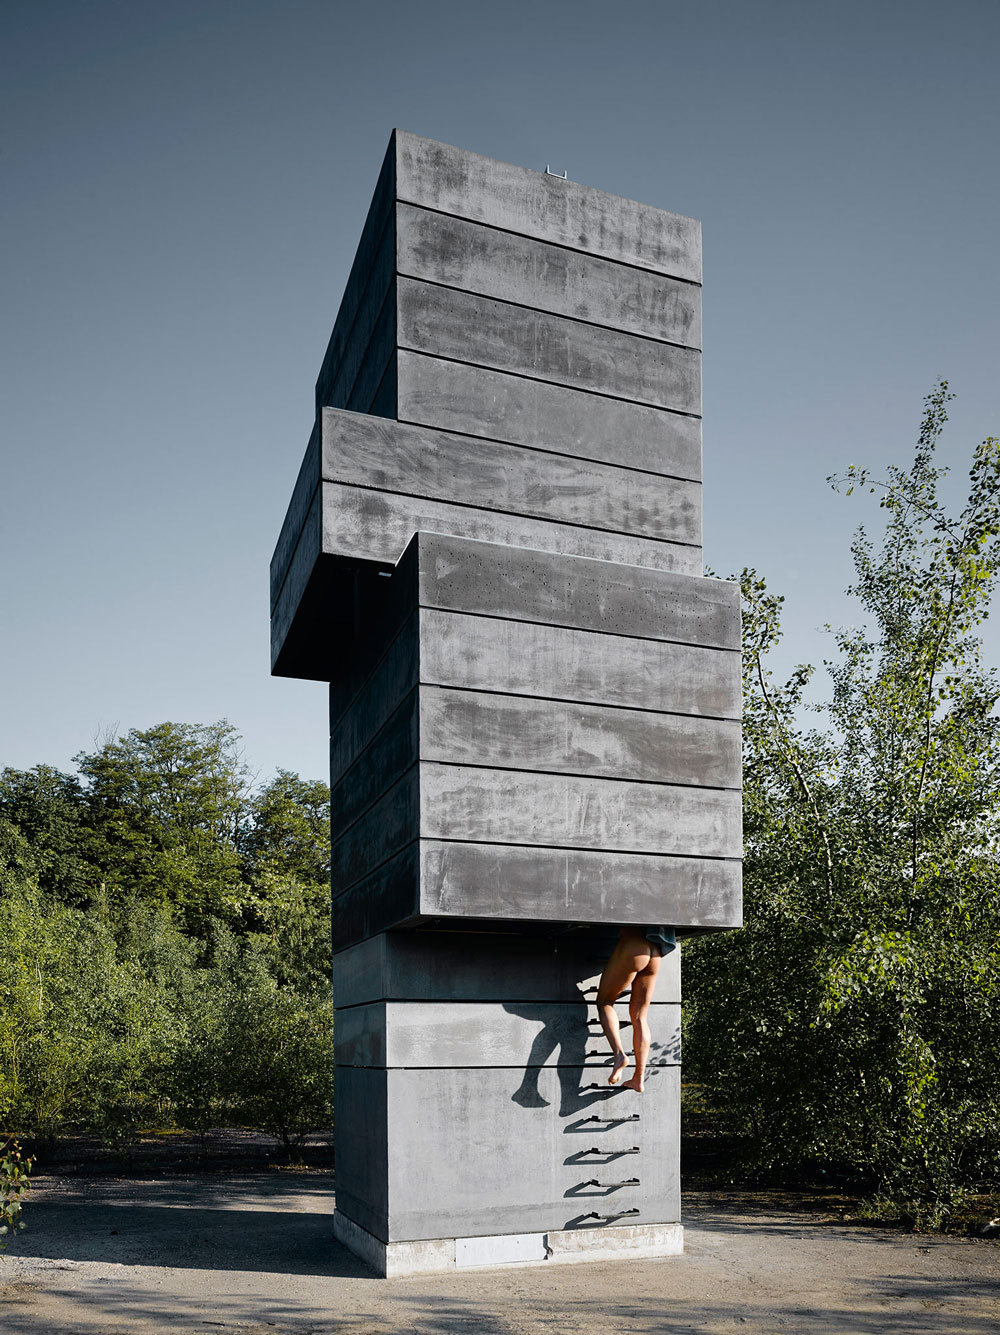 p lda rt k ahogy az opelv rosok el remenek lnek detroit projekt one man sauna. Black Bedroom Furniture Sets. Home Design Ideas